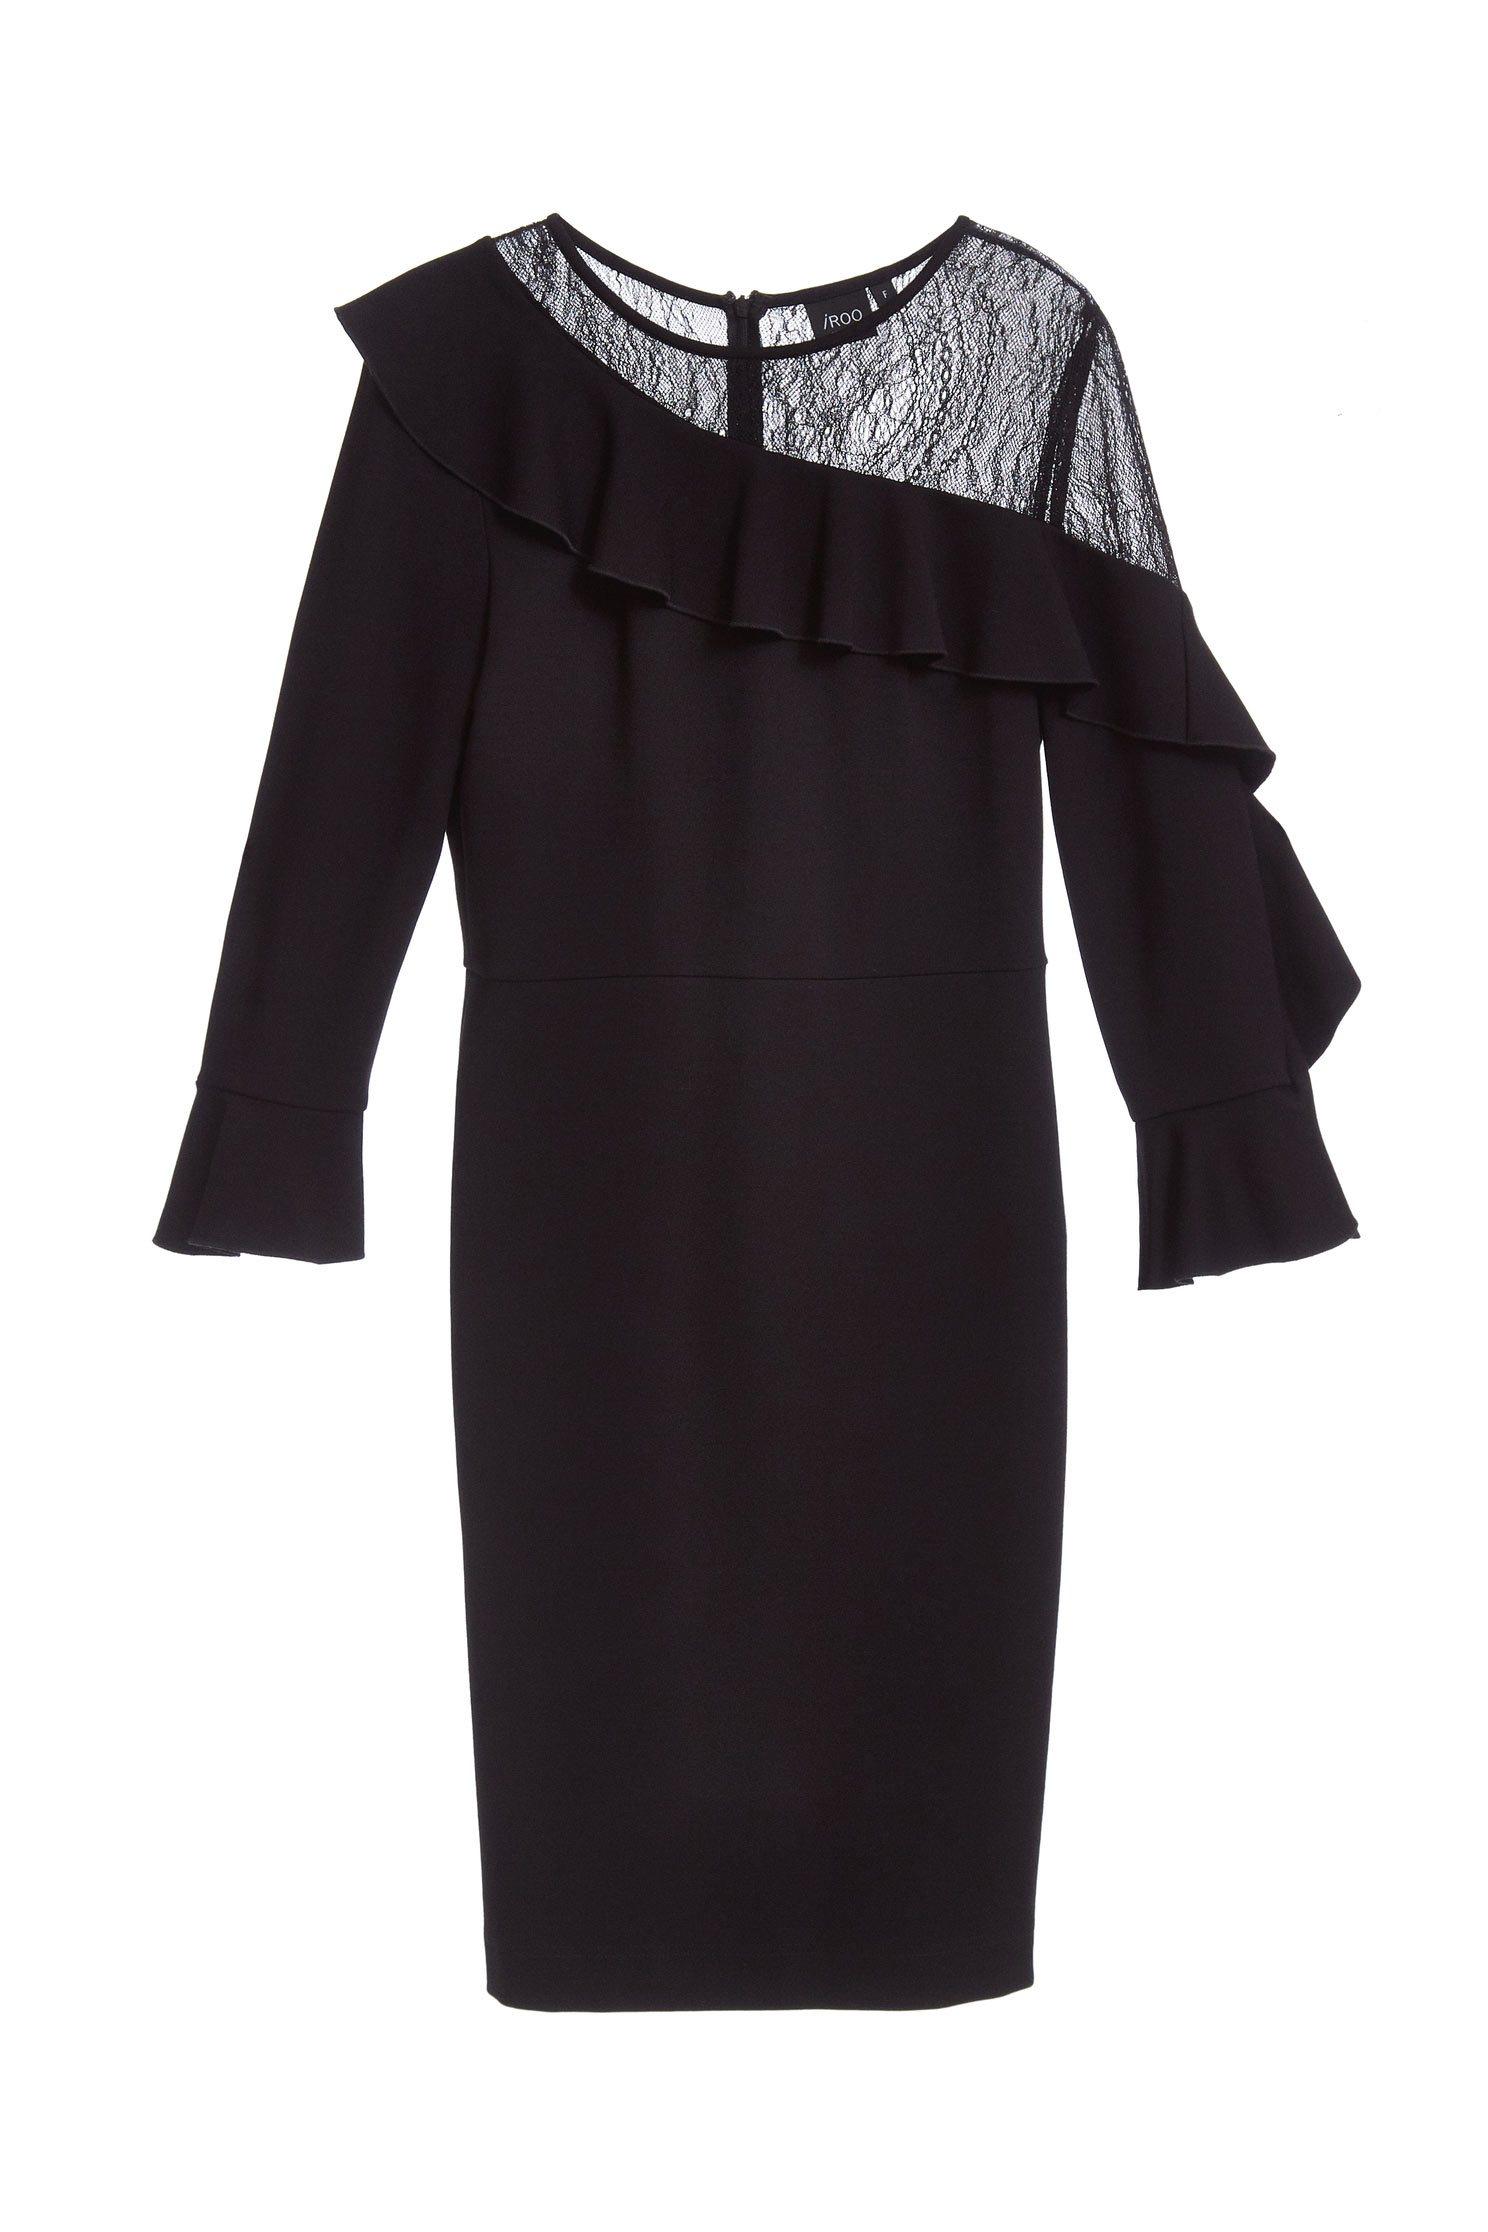 off-shoulder dress with lace trims